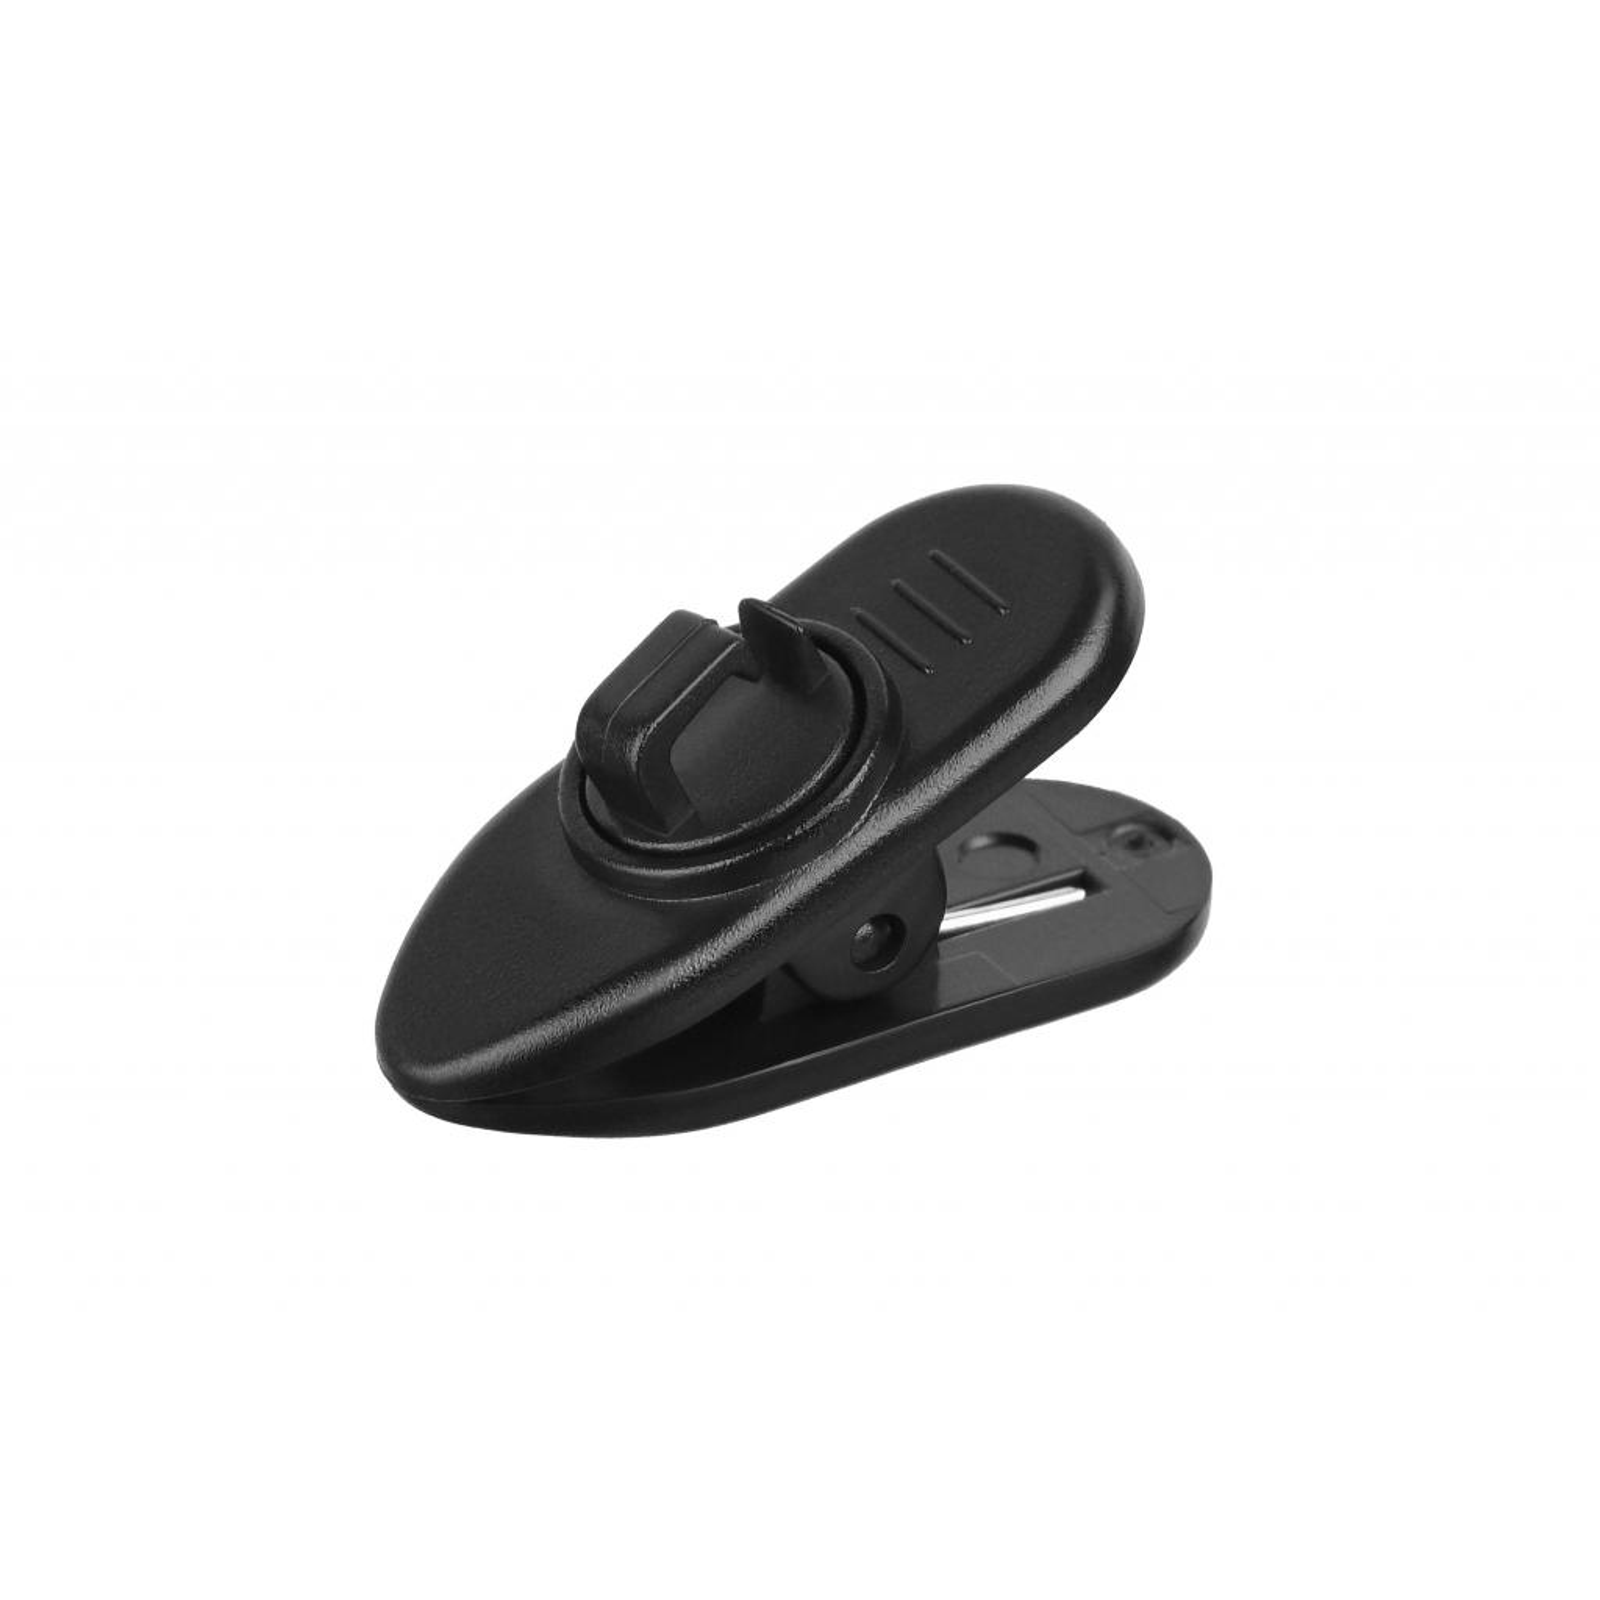 Навушники 2E S6 Pinion Червоний (2E-IES6RD) зображення 3